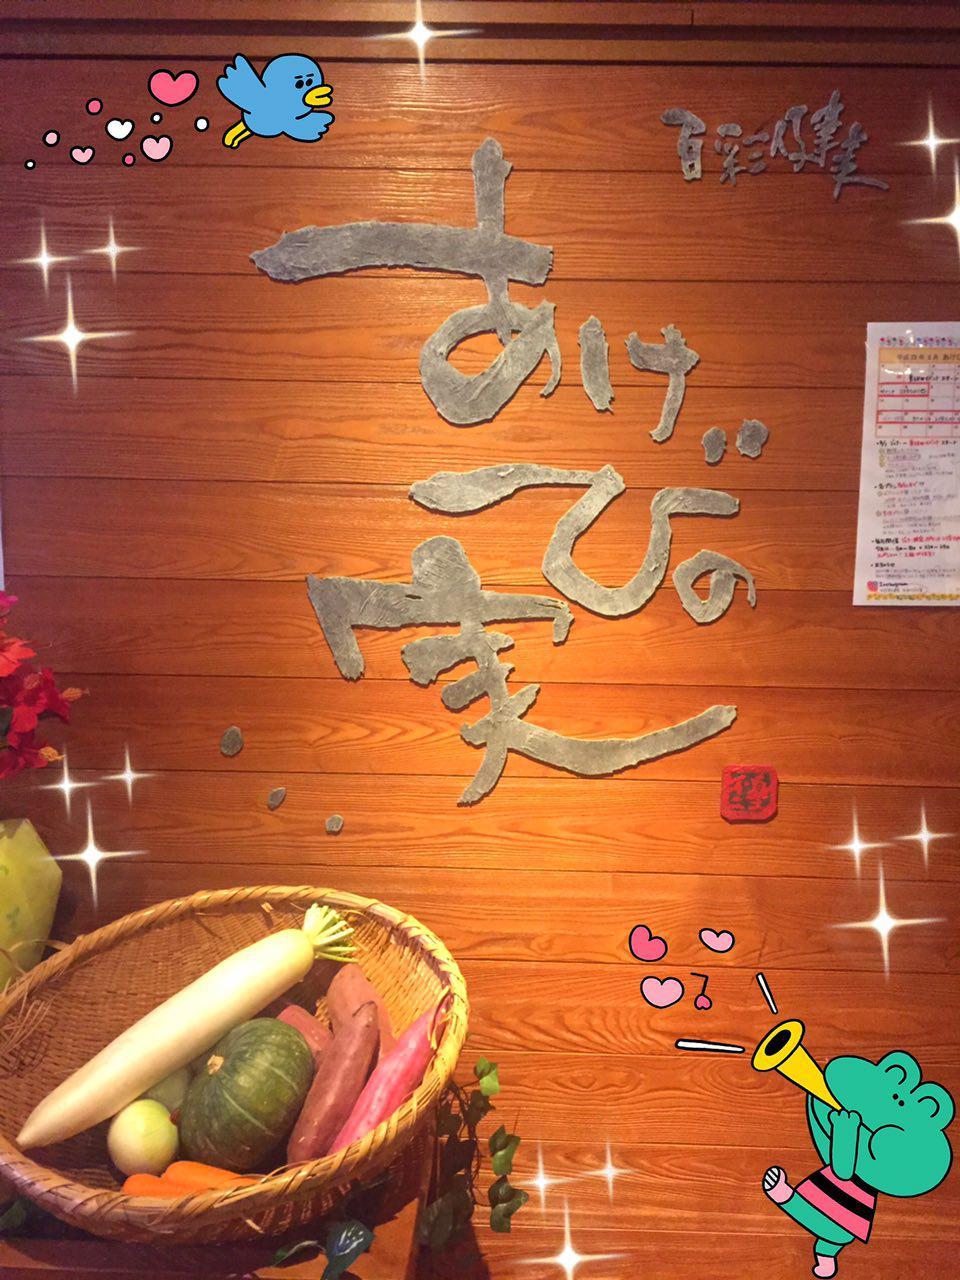 photo_2017-08-23_21-45-34.jpg